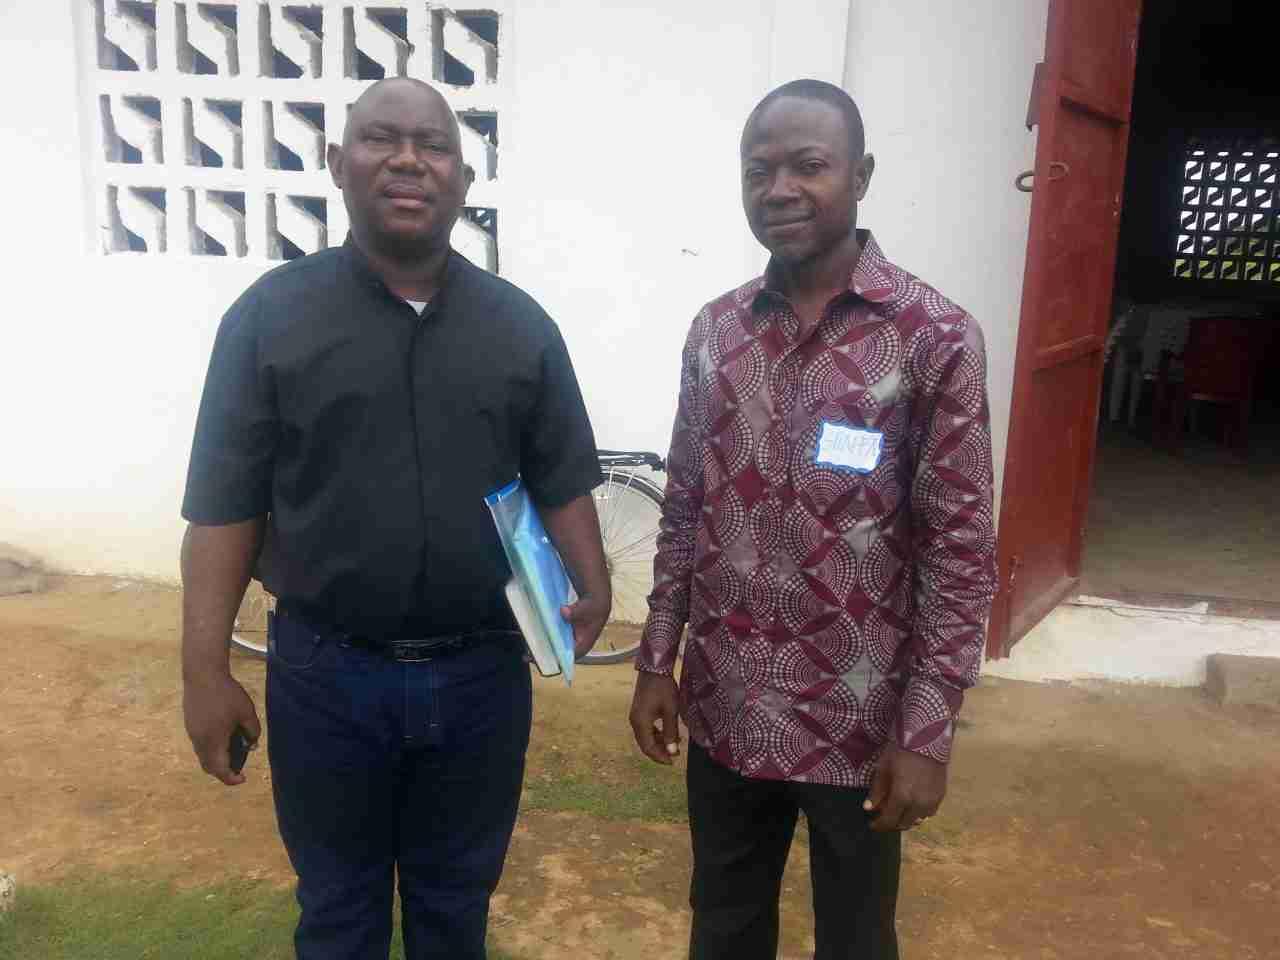 Rev. Bommassee and Rev. Shaffa Seward